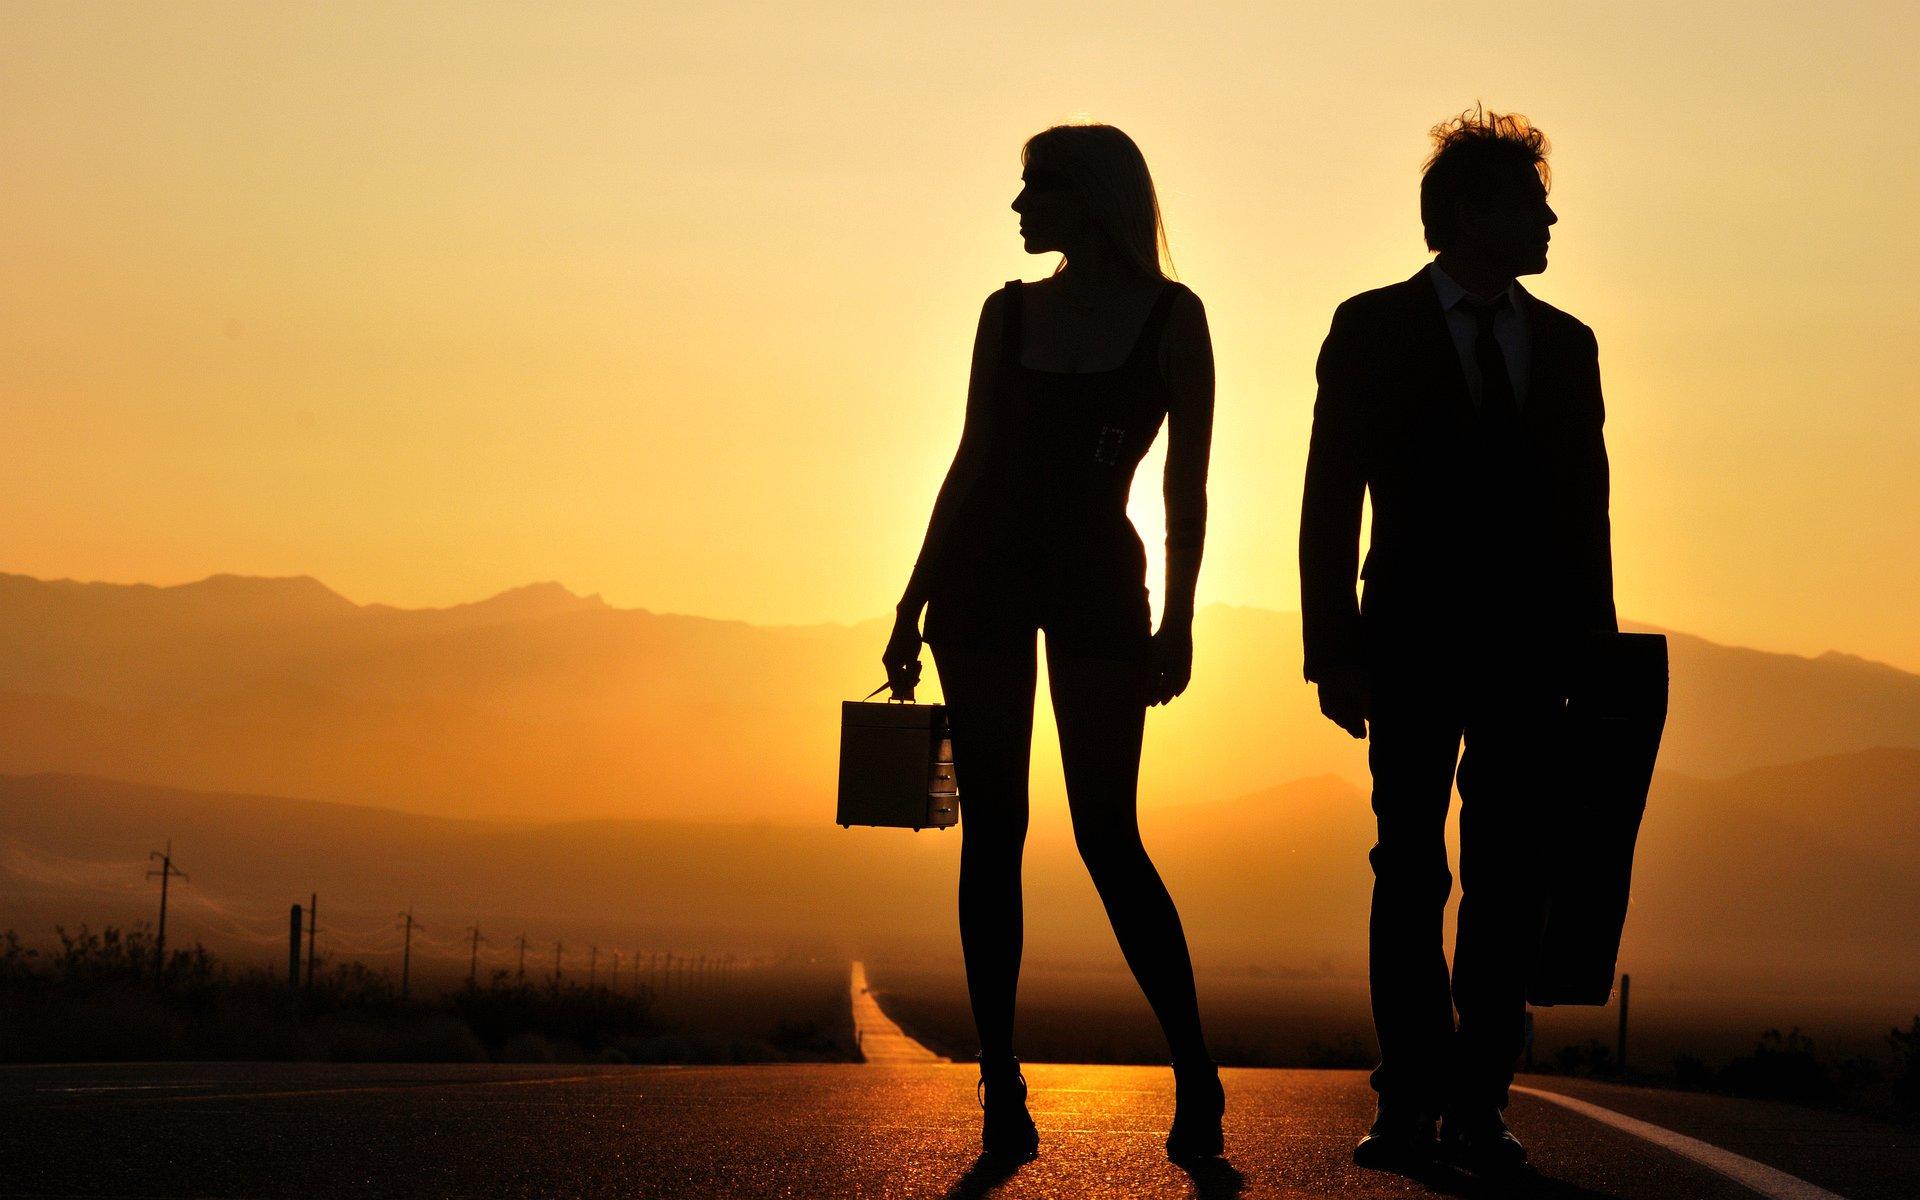 wallpaper-man-and-woman-at-sunset